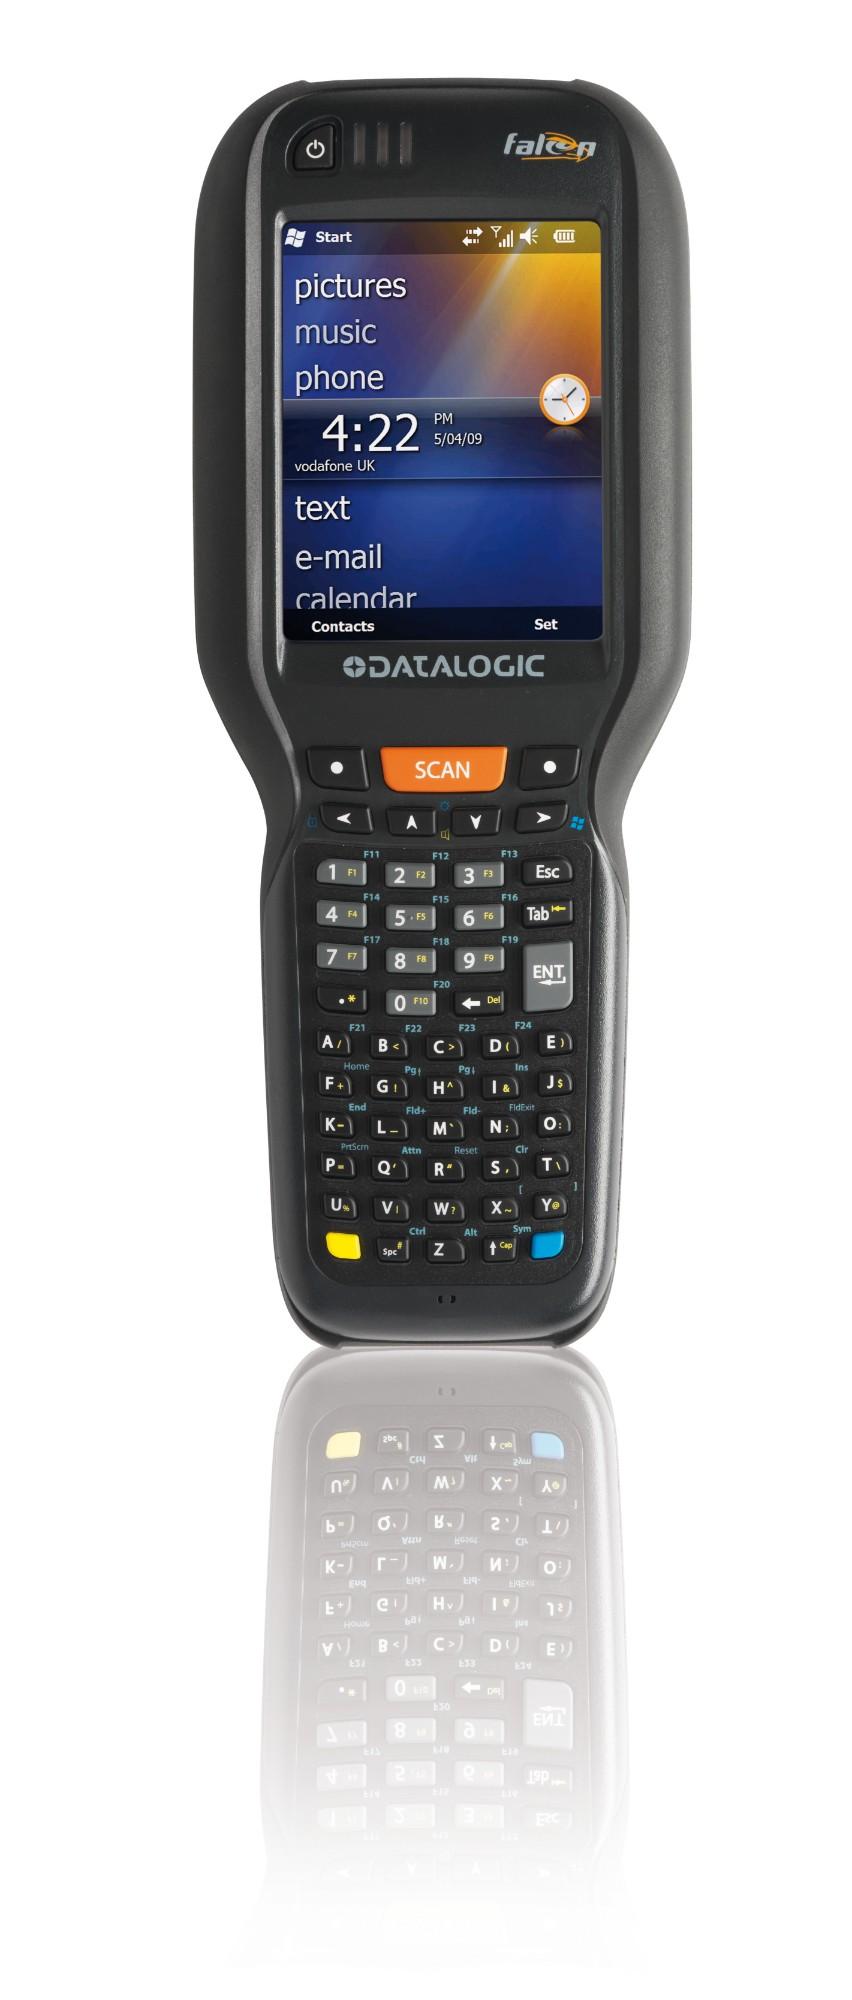 "Datalogic Falcon X3+ ordenador móvil industrial 8,89 cm (3.5"") 320 x 240 Pixeles Pantalla táctil 674 g Negro"